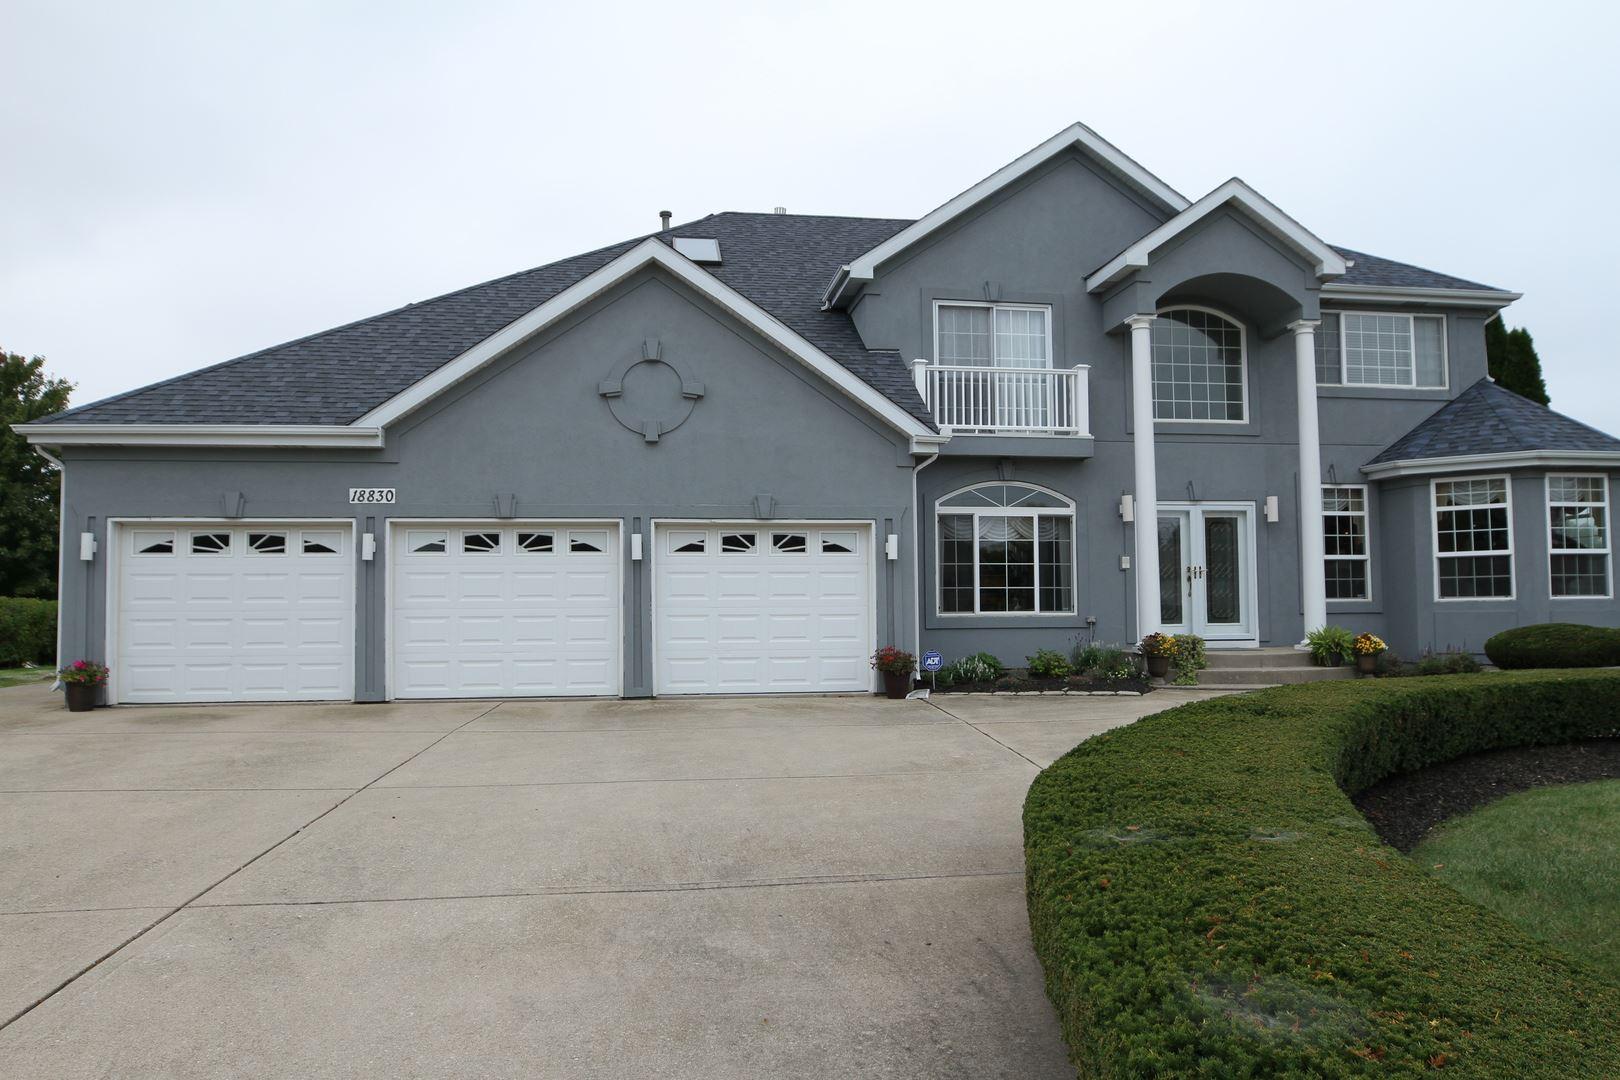 Photo of 18830 S Chestnut Drive, Shorewood, IL 60404 (MLS # 10880442)